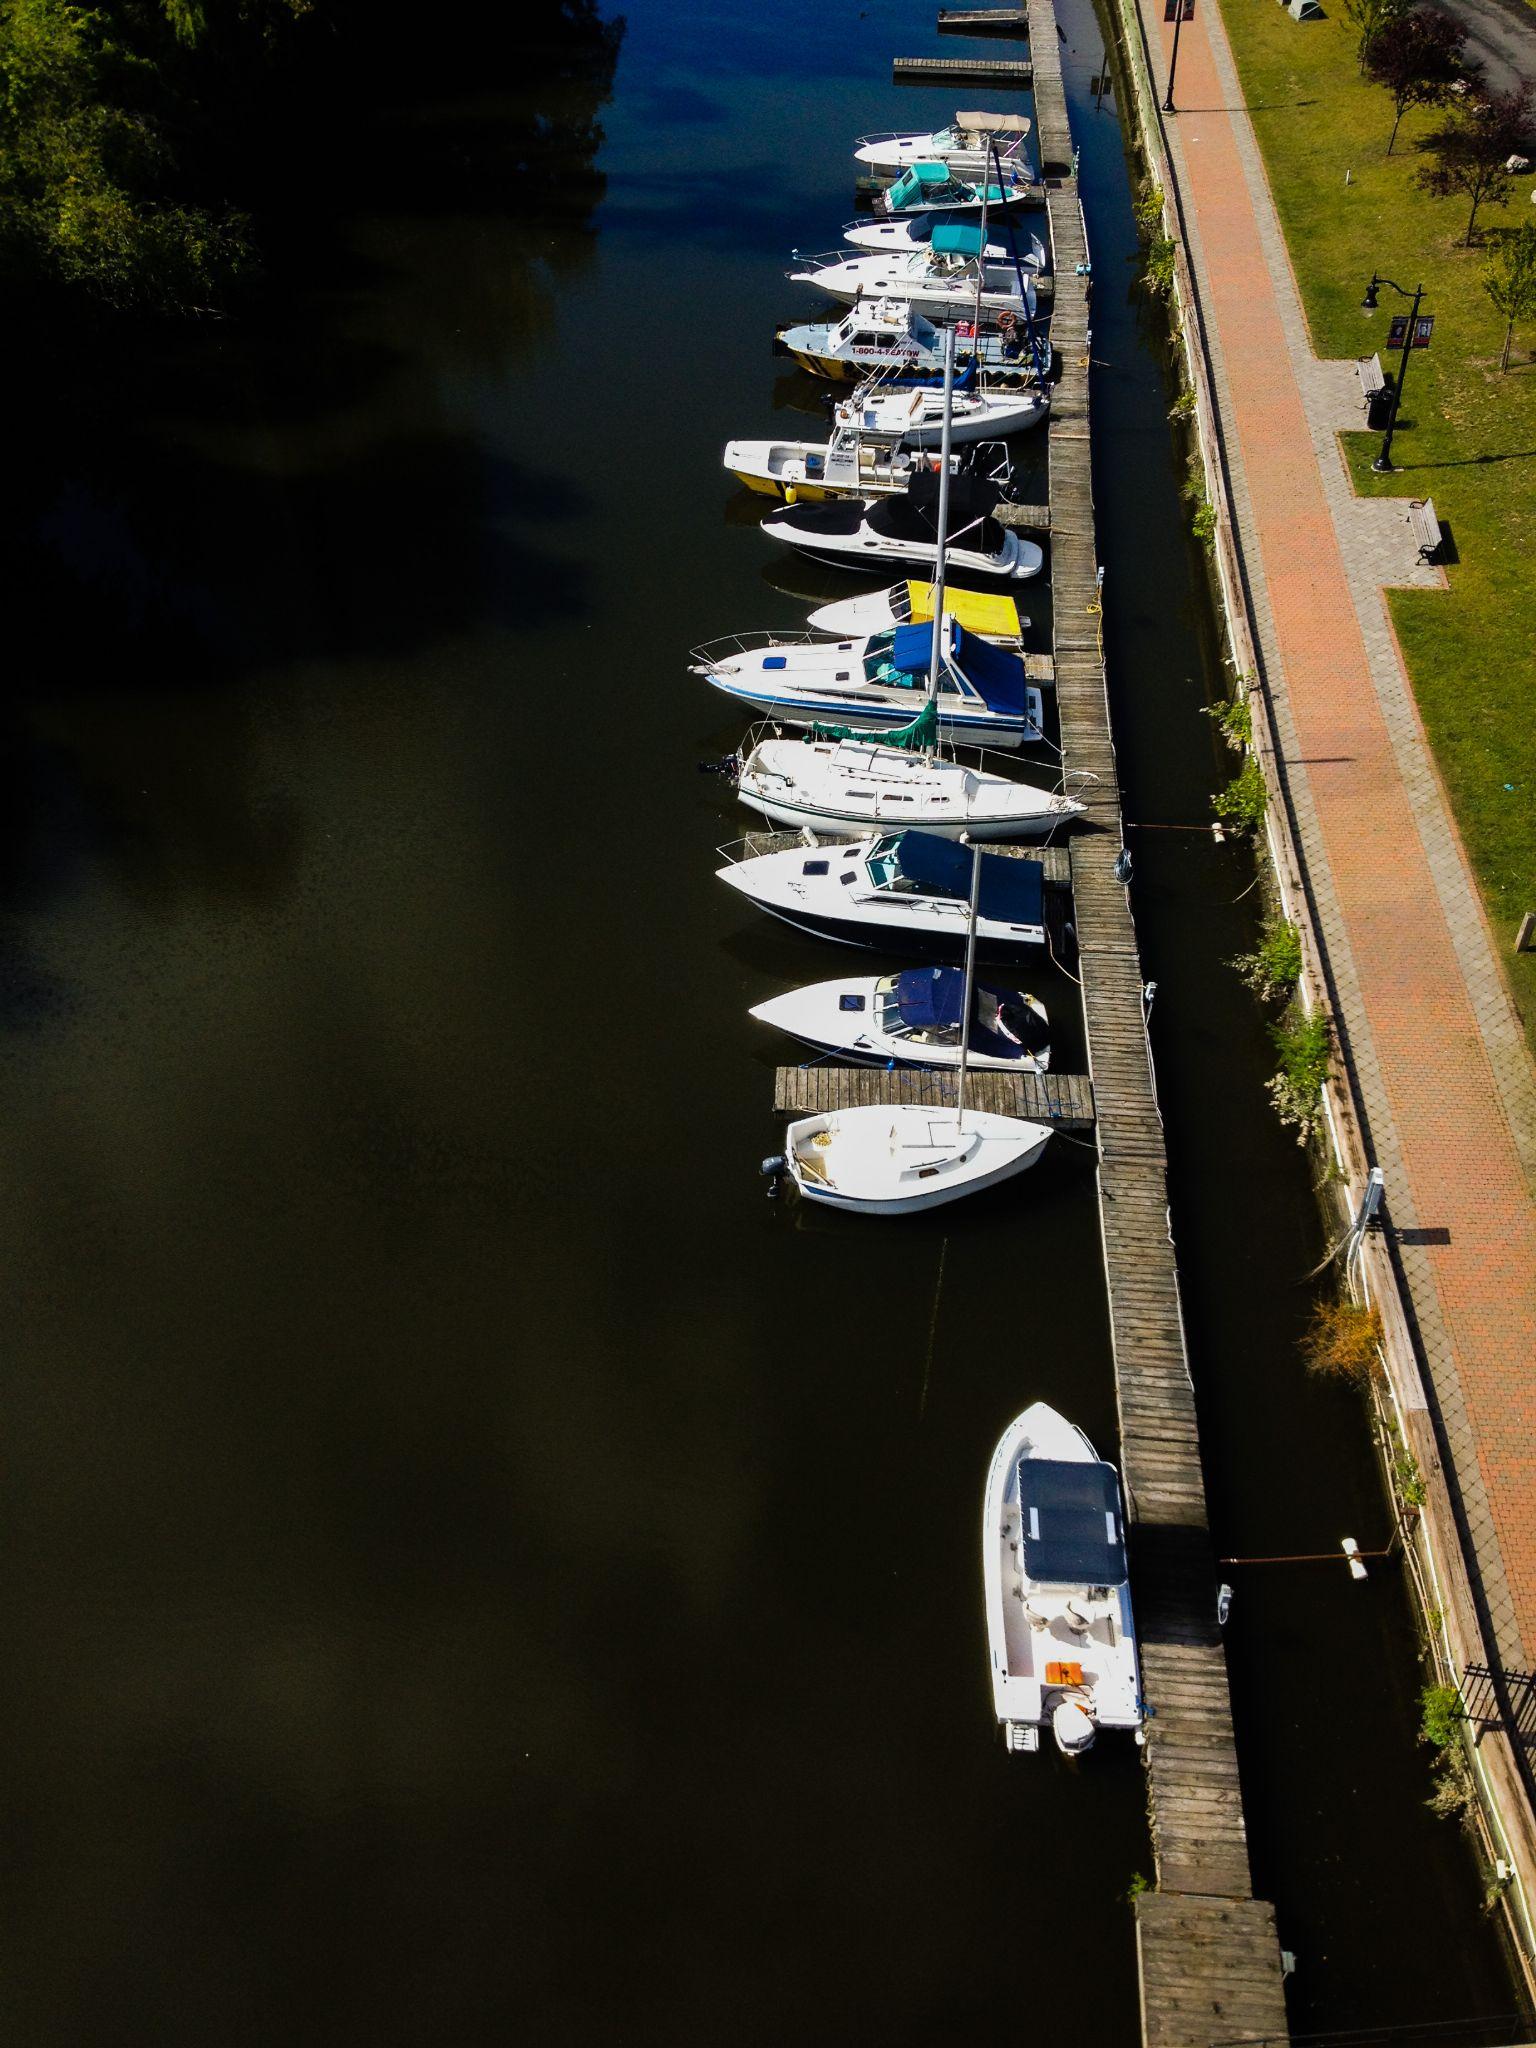 Kingston City Docks by Ruth Silvers